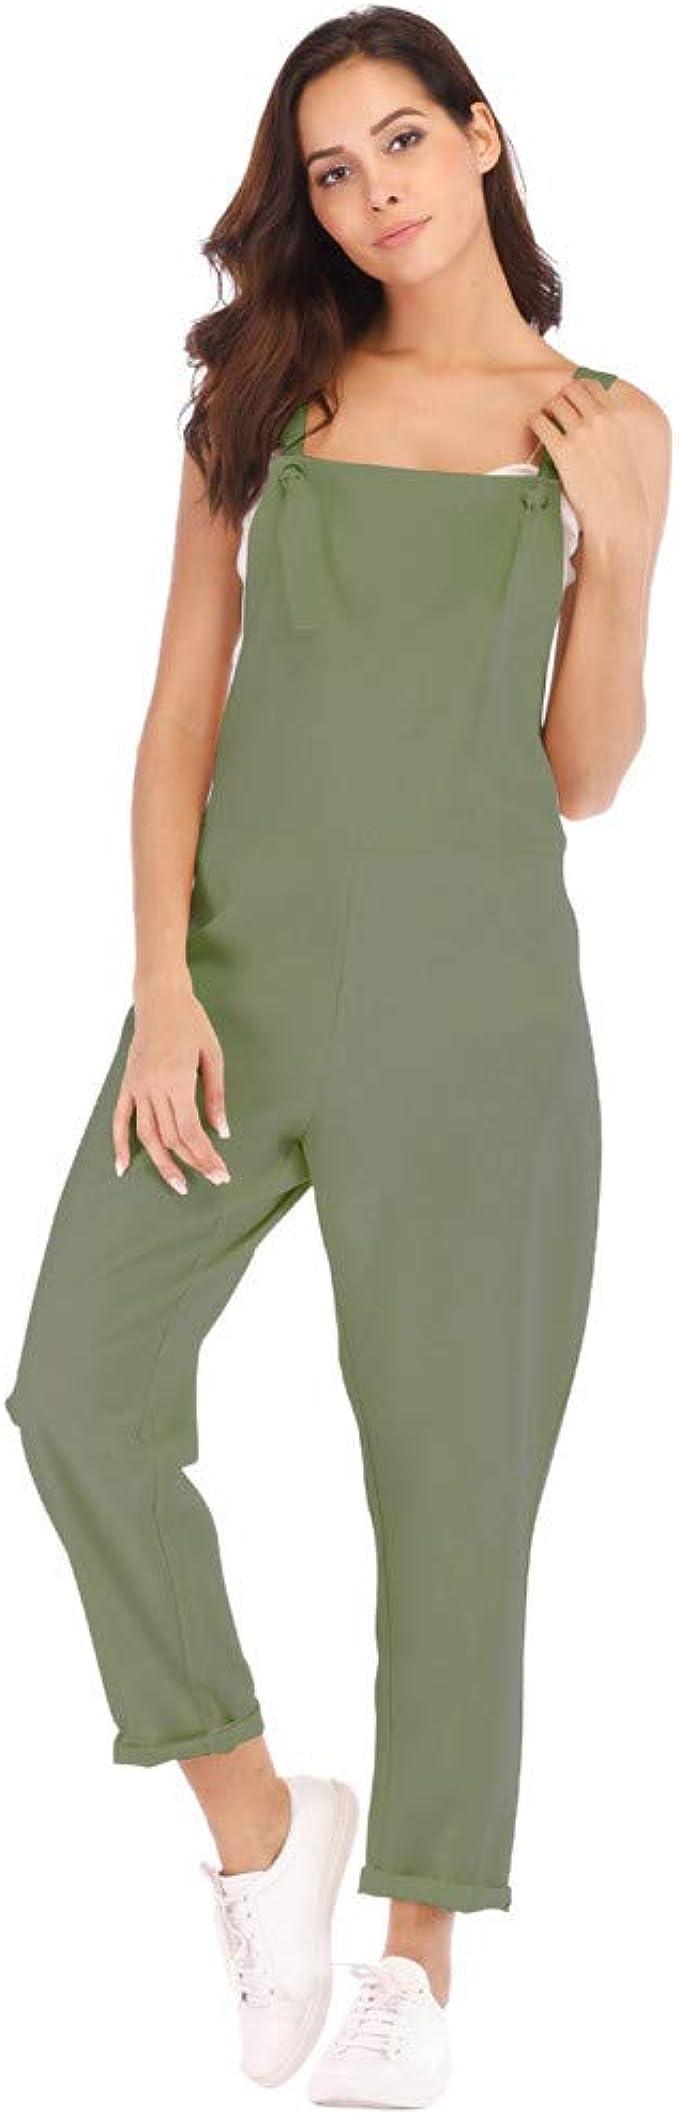 RISTHY Petos de Pantalones Largo Casual para Mujer, Monos Verano ...